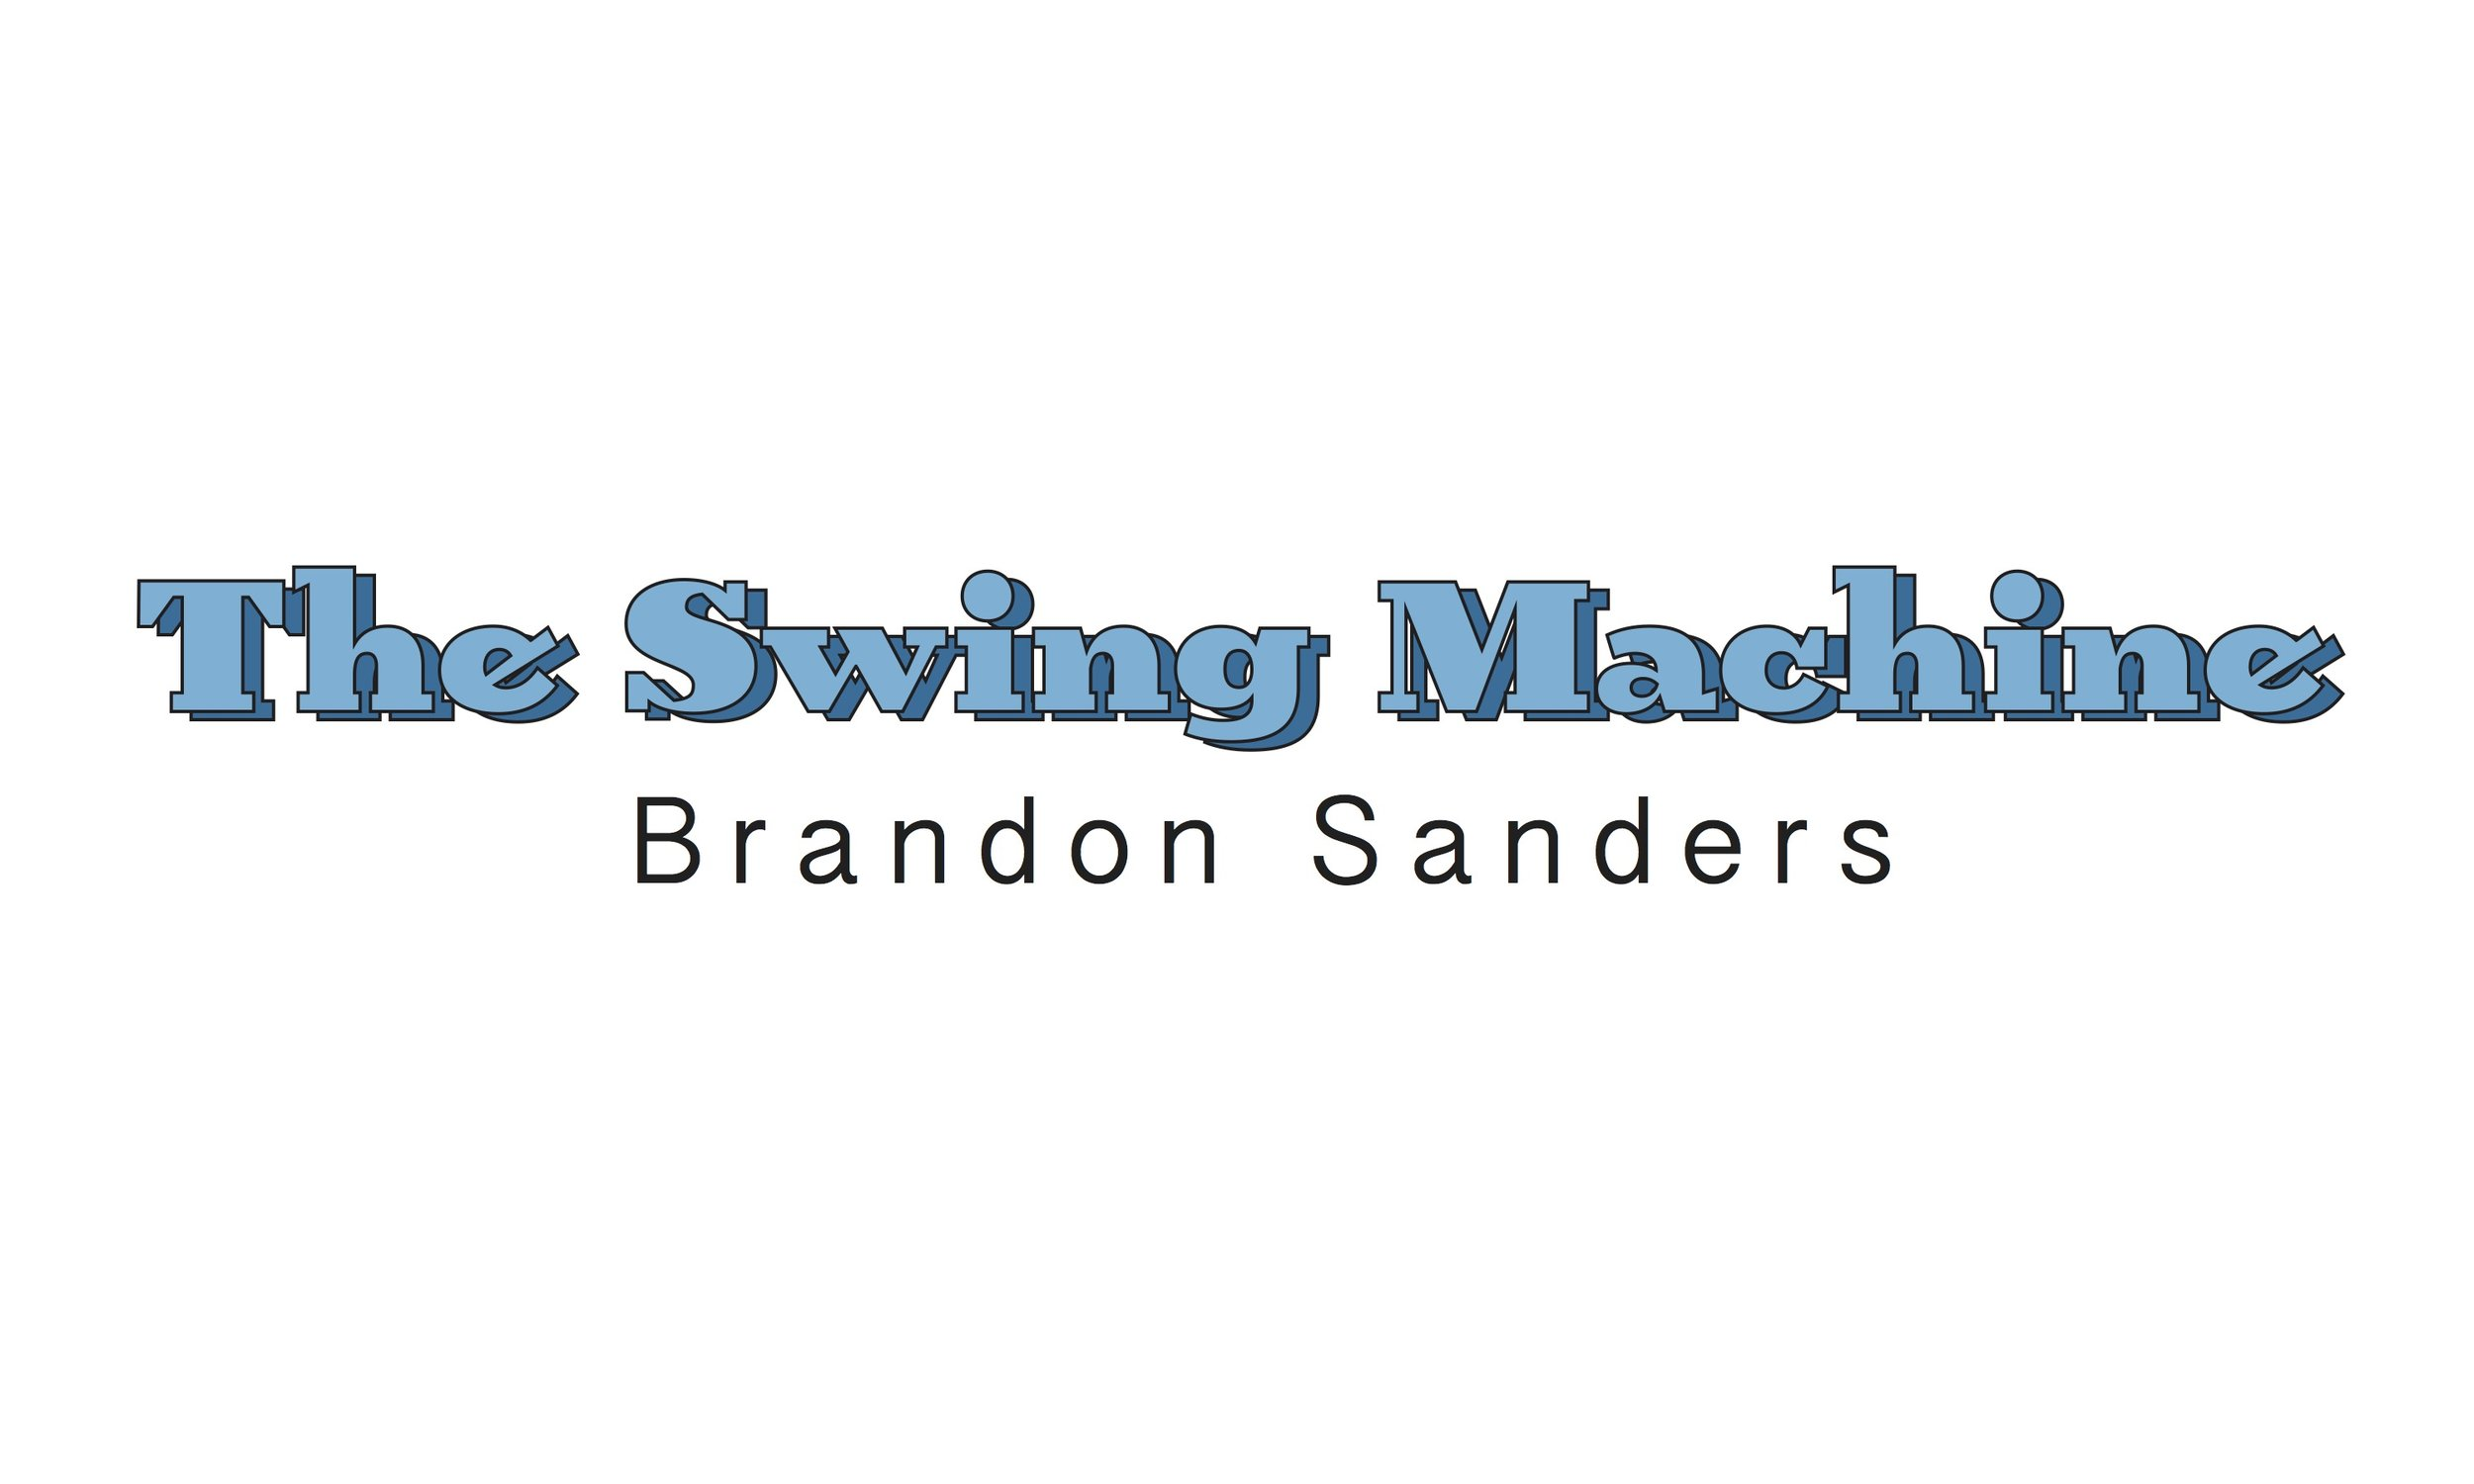 brandon sanders logo2.jpg